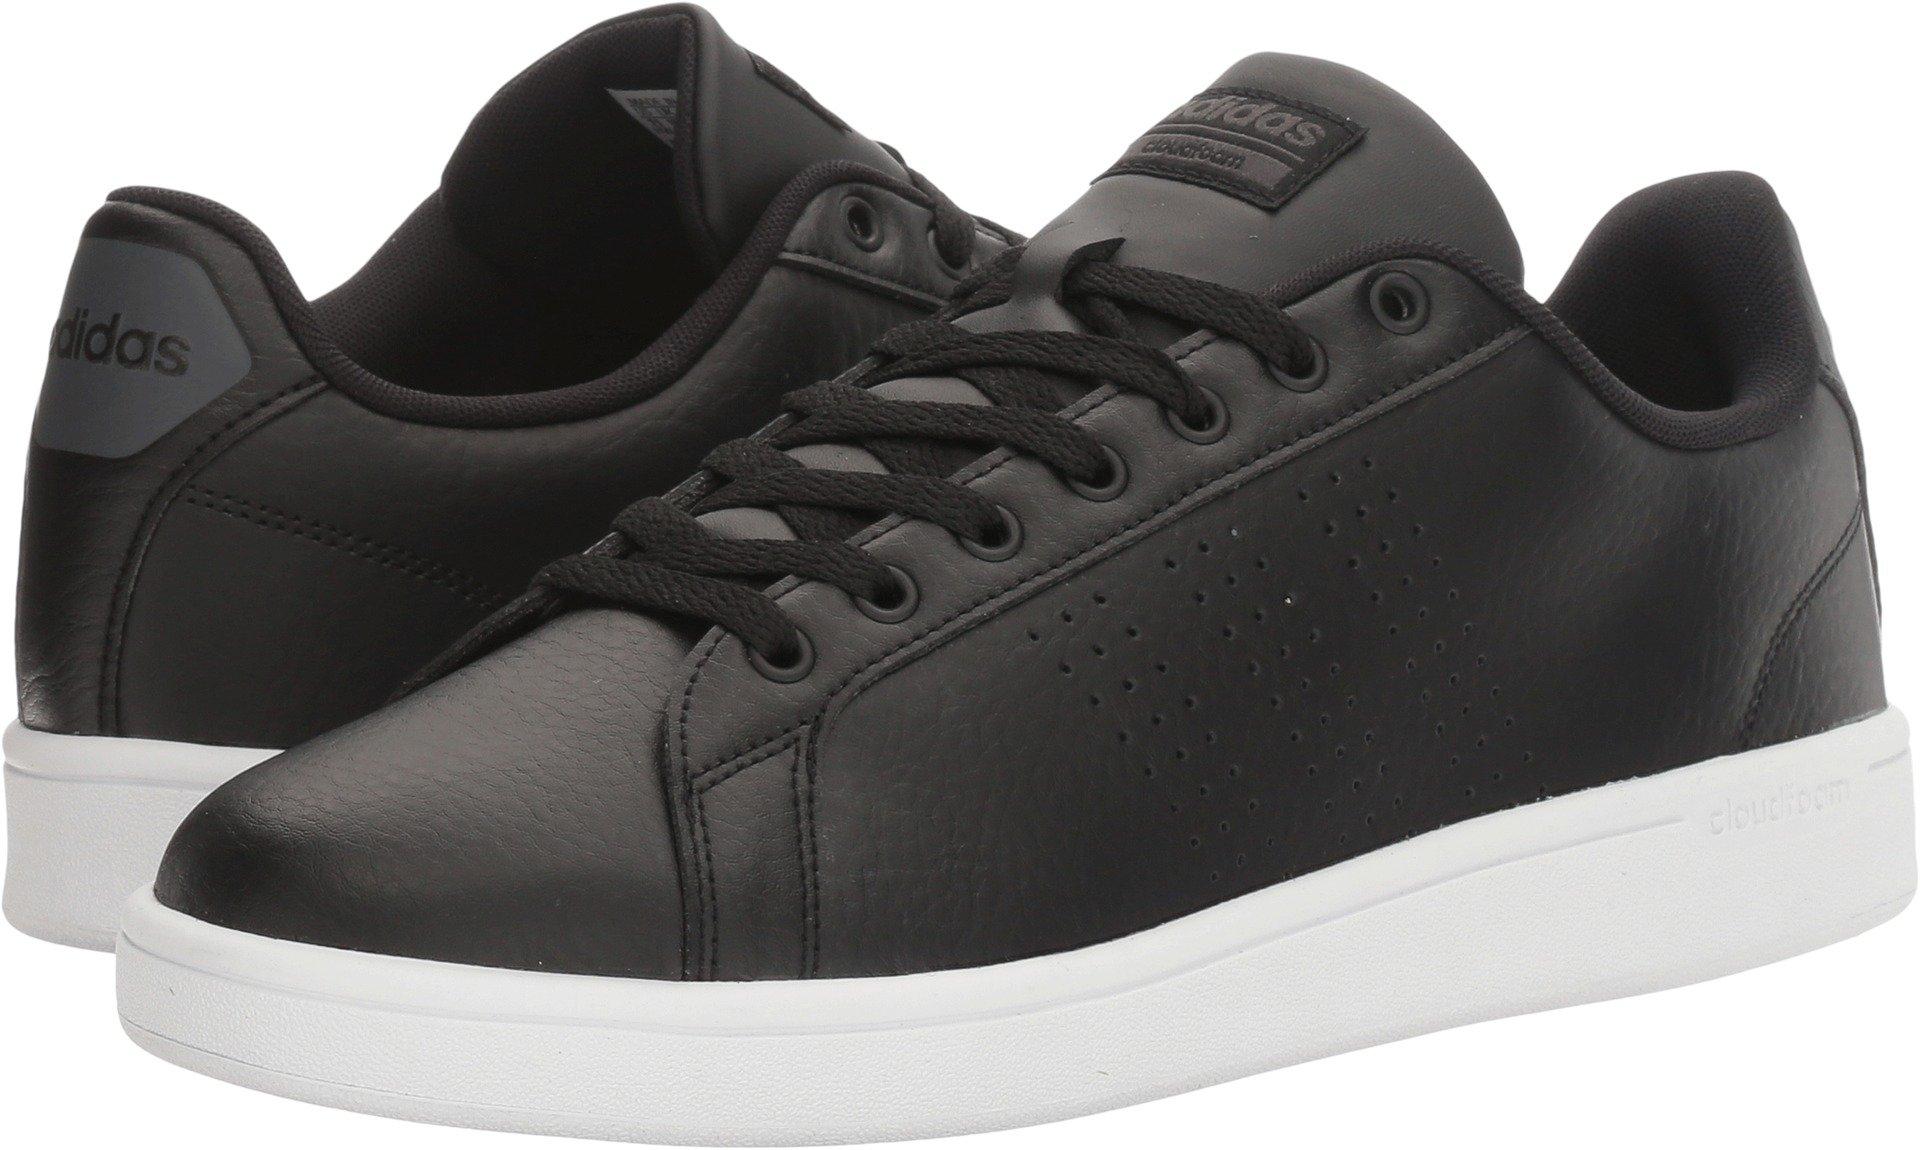 adidas Men's Cloudfoam Advantage Clean Sneakers, Black/Black/White, (8.5 M US)